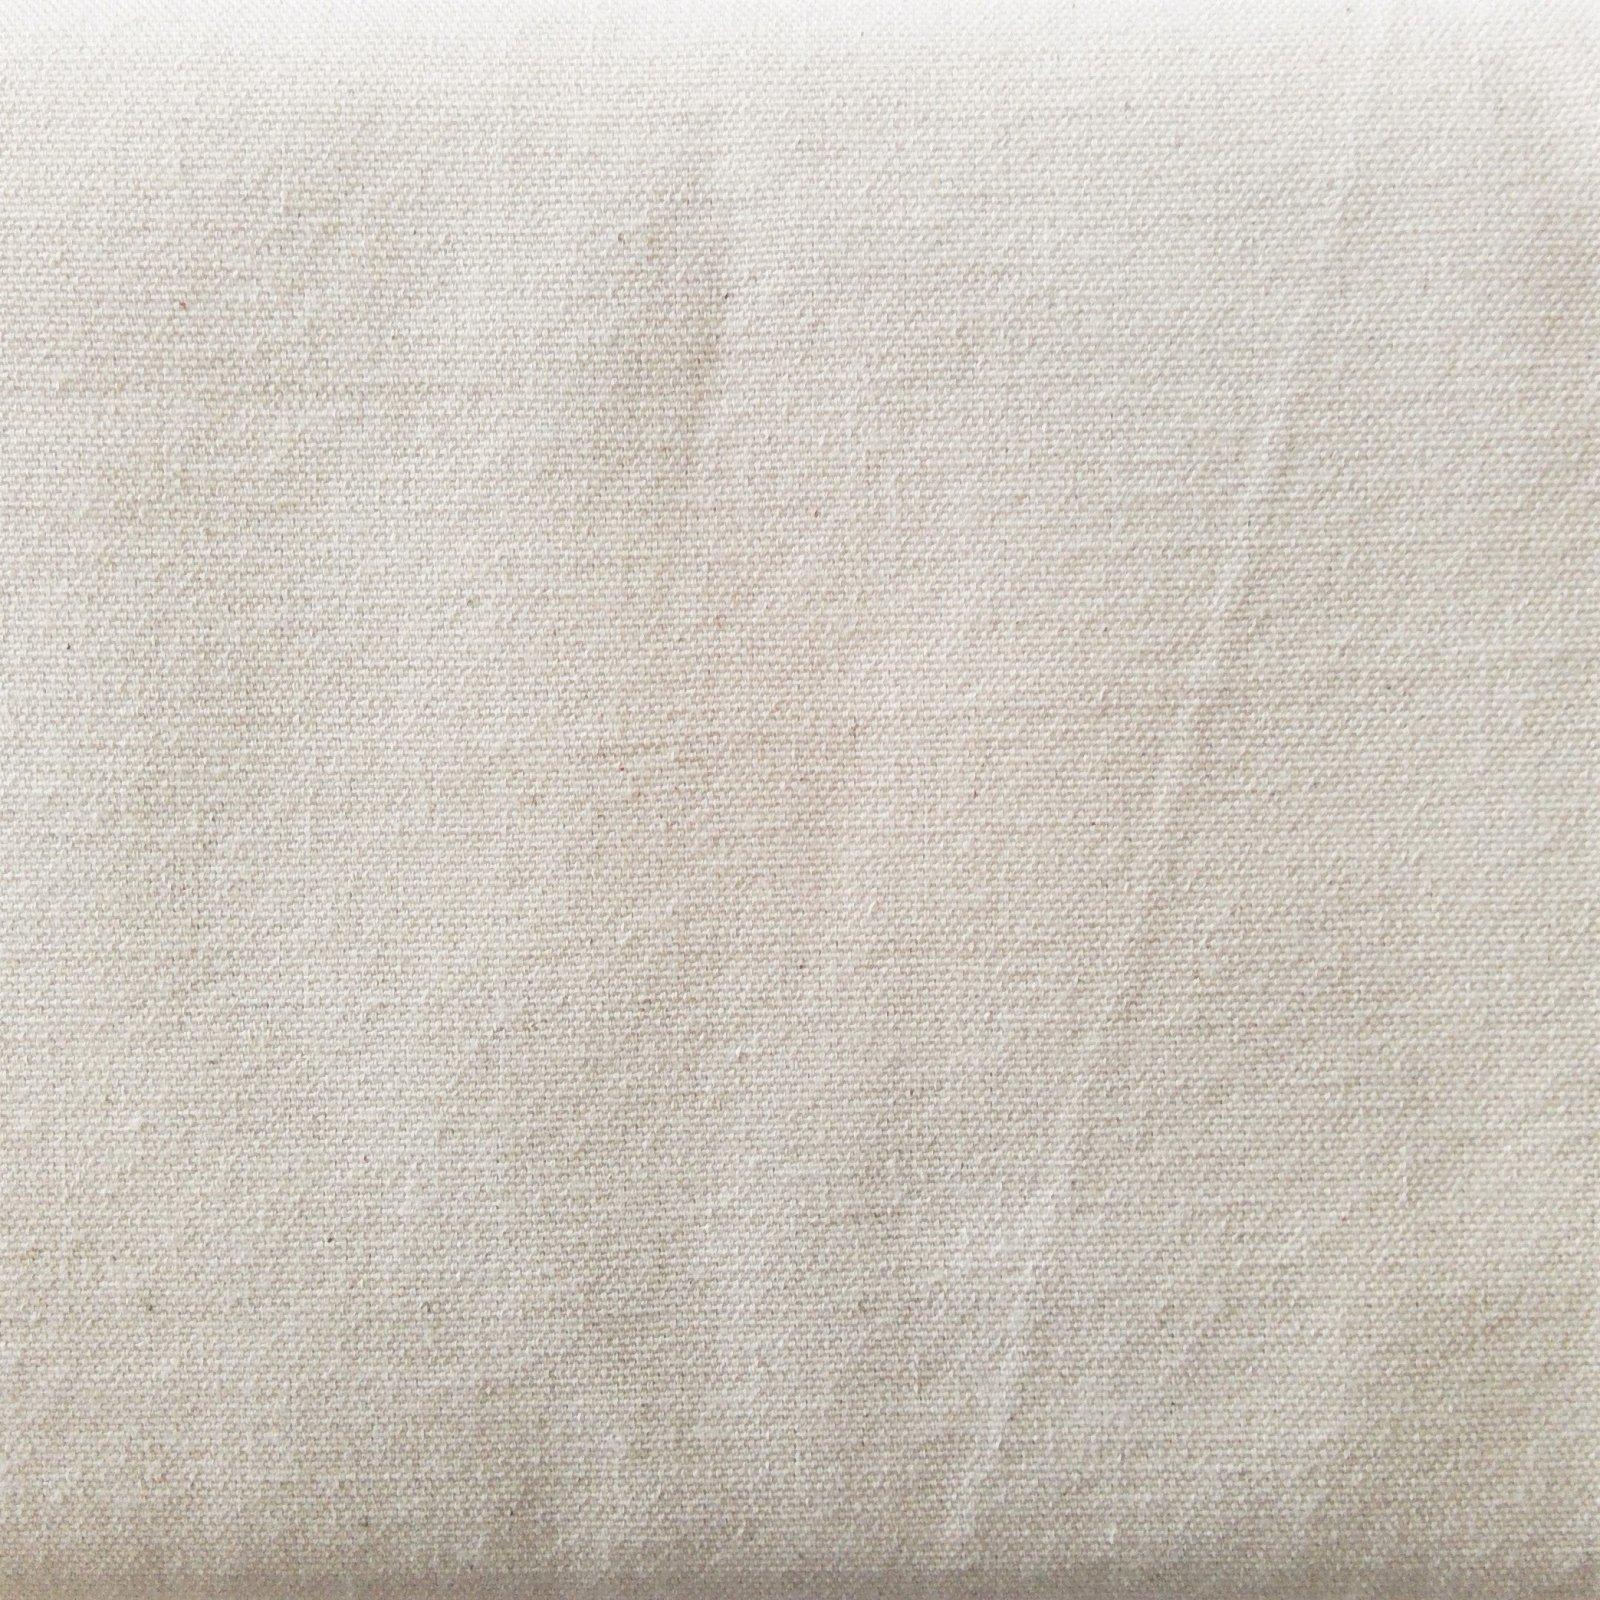 Canvas Solid 100% Cotton, Beige